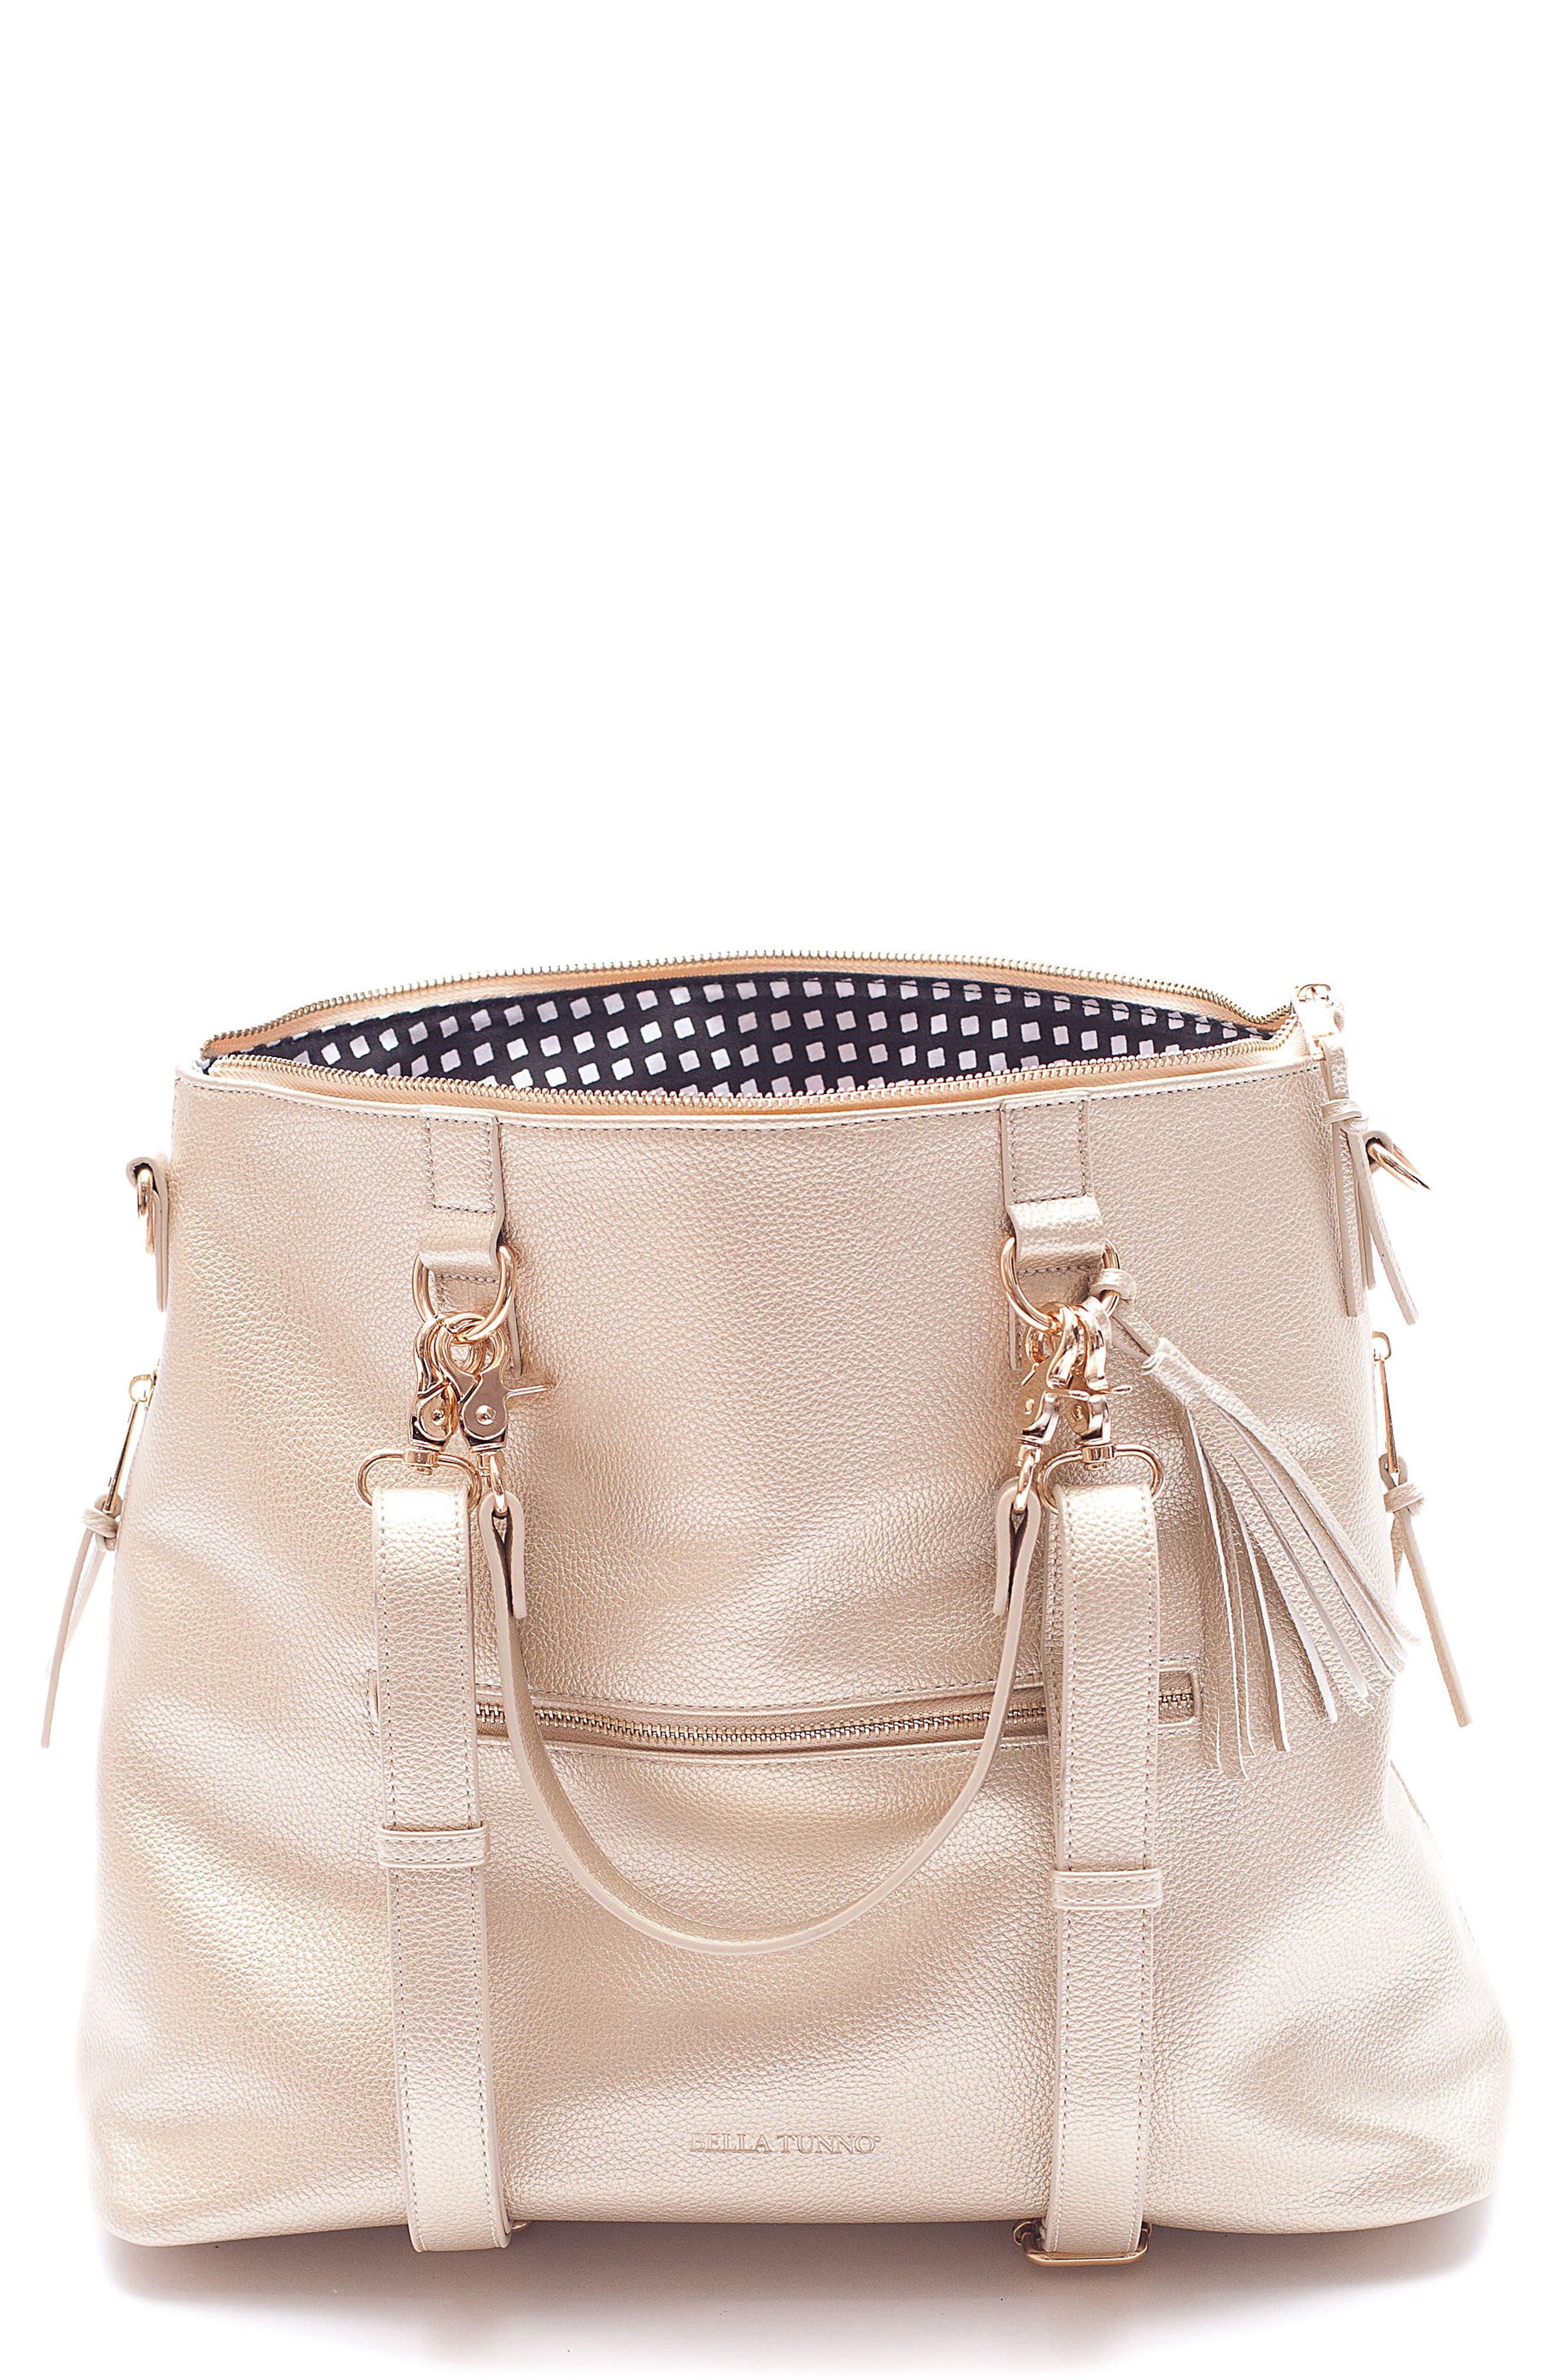 Main Image - Bella Tunno Boss Convertible Diaper Backpack